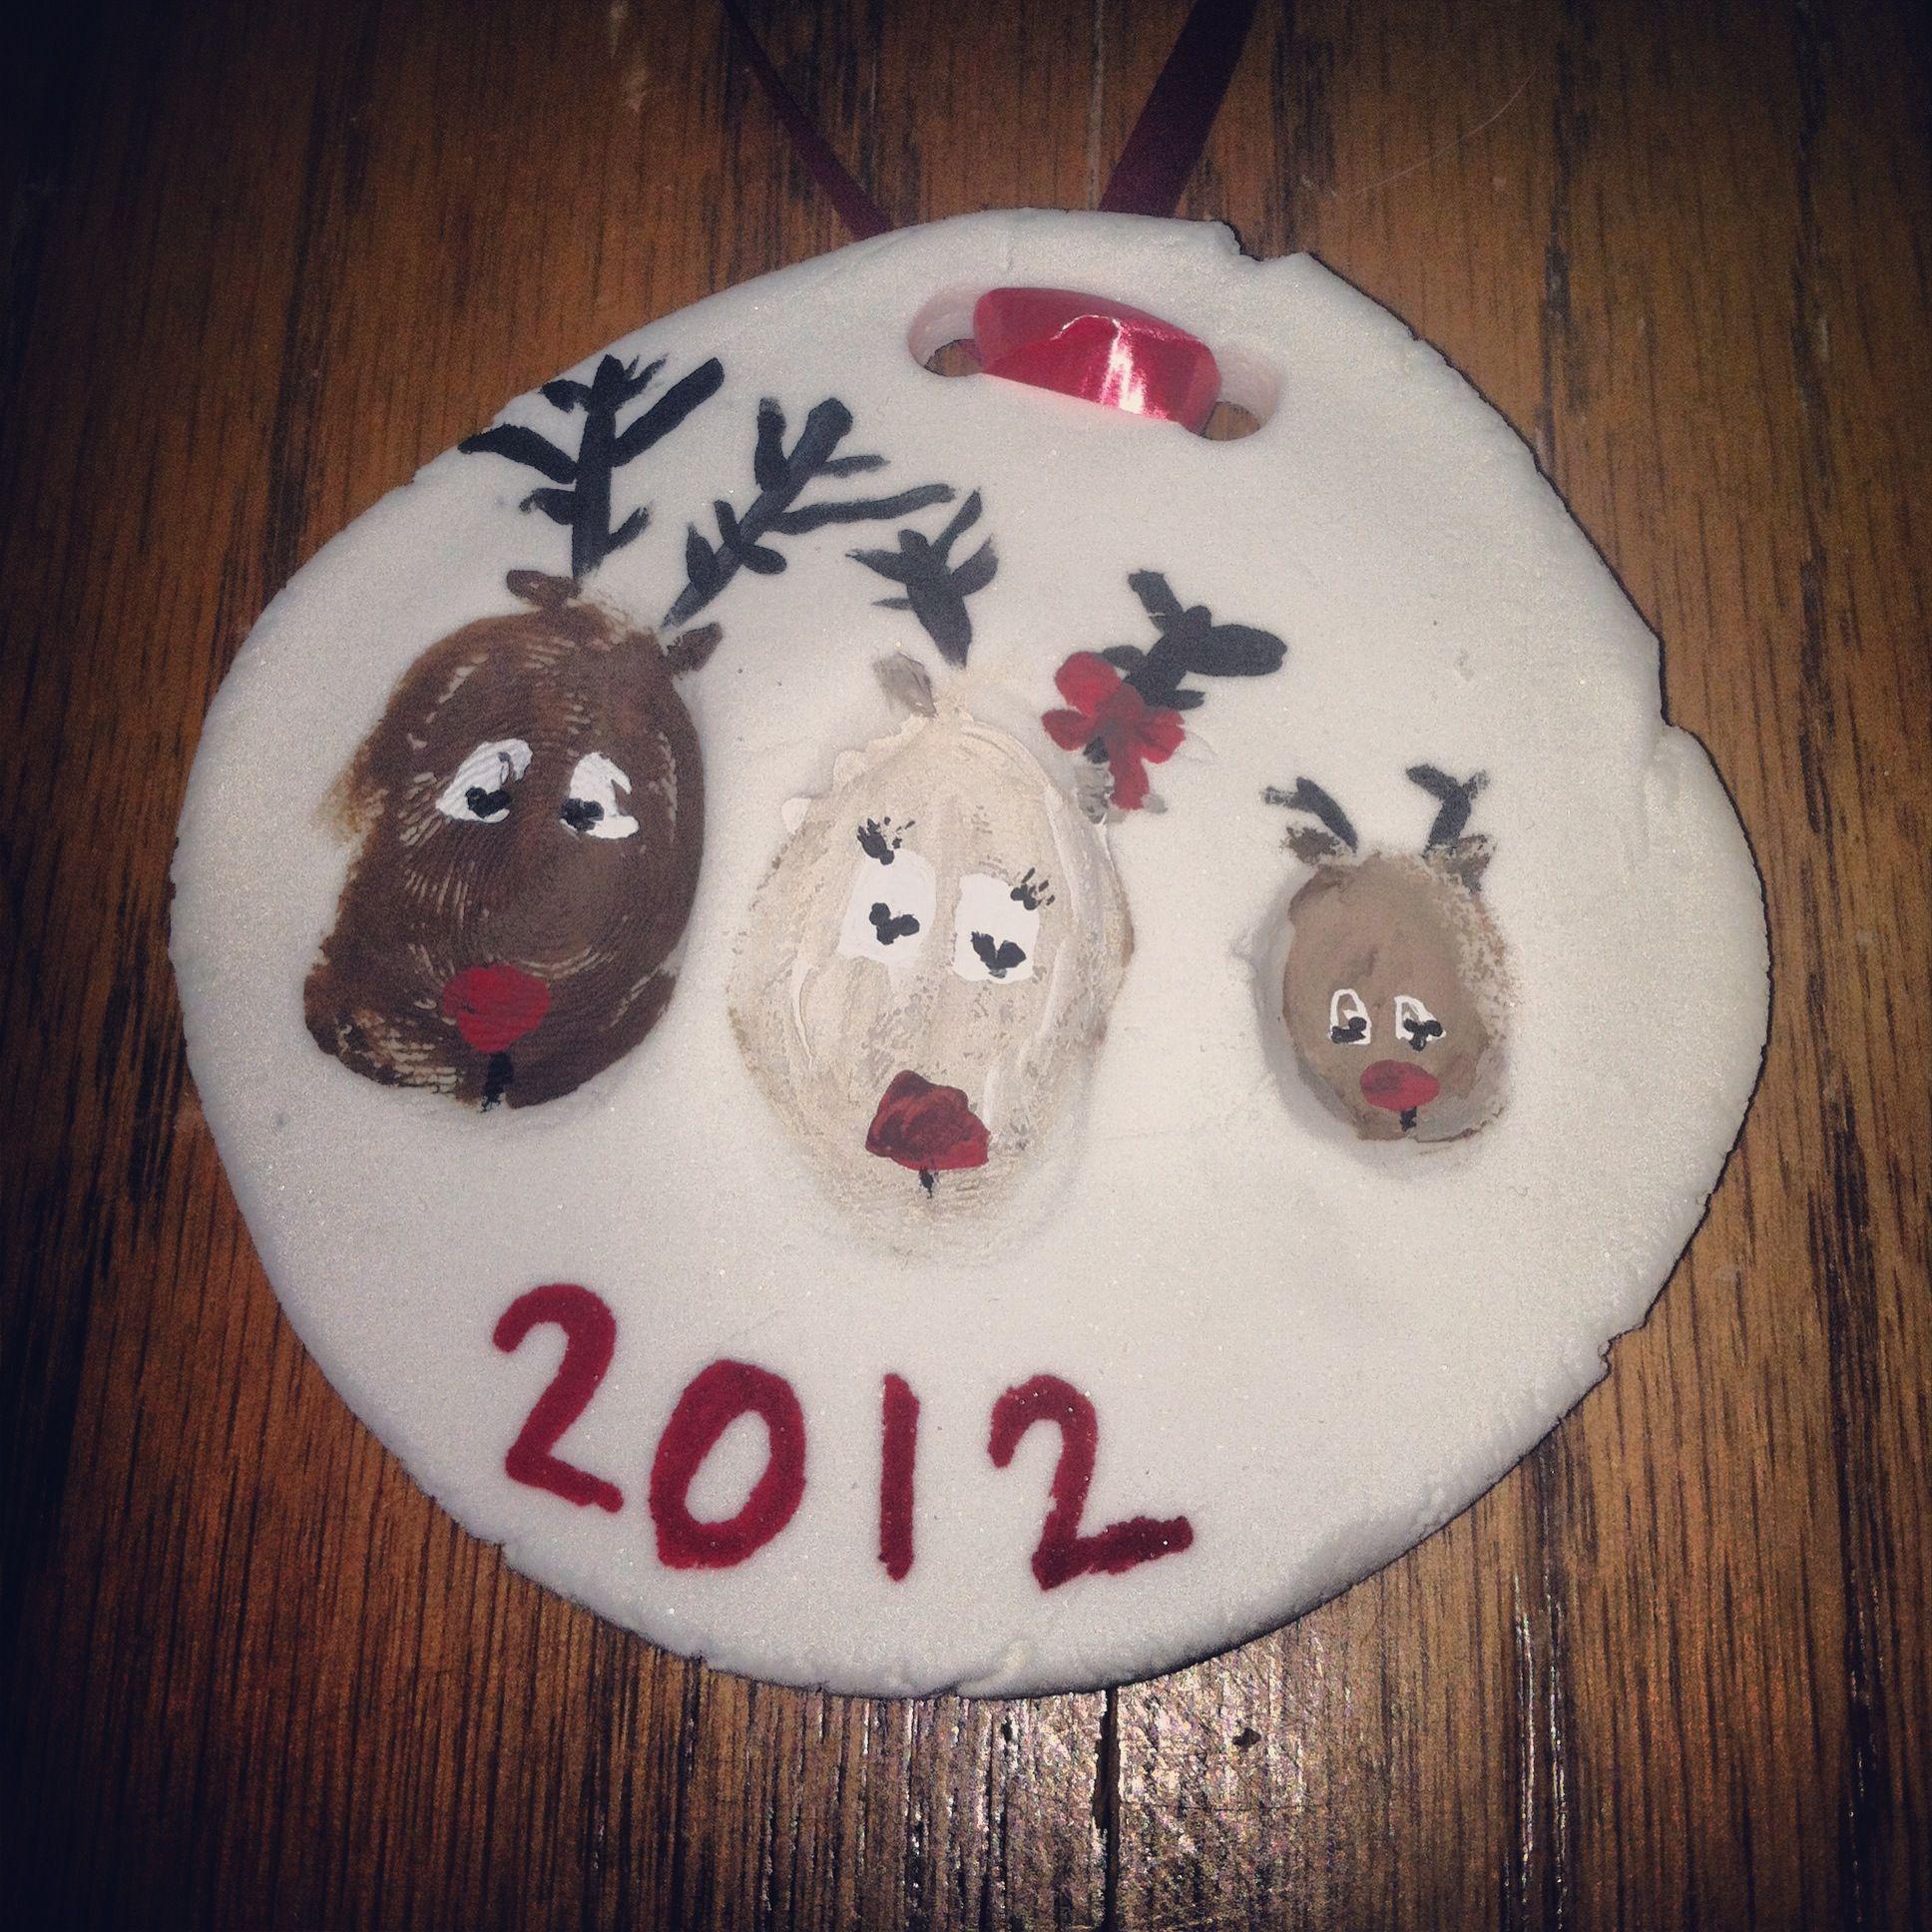 Thumbprint Reindeer Ornament Better Then Salt Dough Thumb Print Paint Seal With Modge Podg Christmas Ornaments Homemade Homemade Christmas Christmas Memory